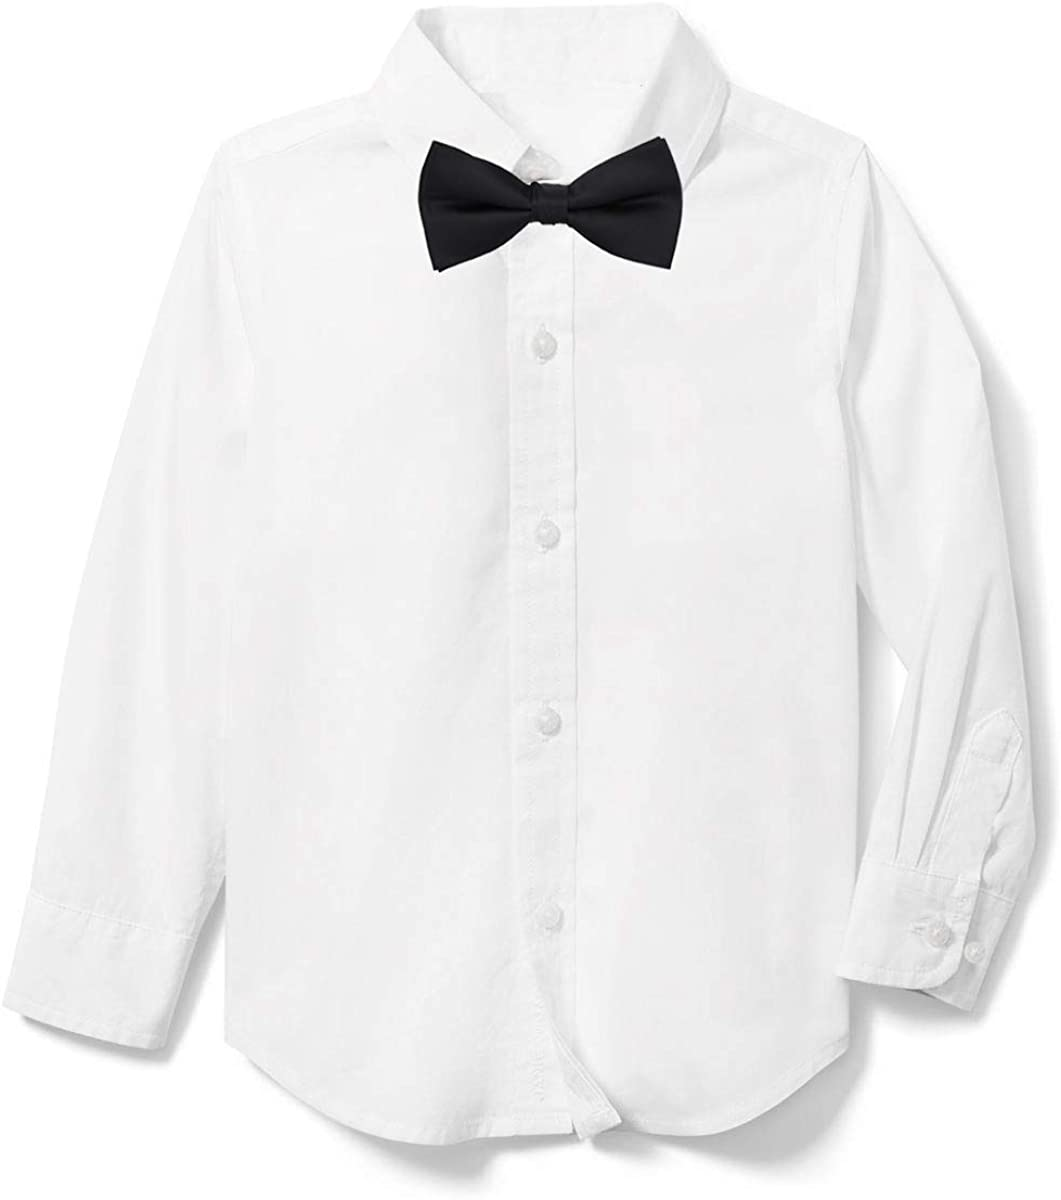 Rolanko Boys' Long Sleeve Dress Shirt, Boys White Tuxedo Button-Down Shirts with Bow Tie